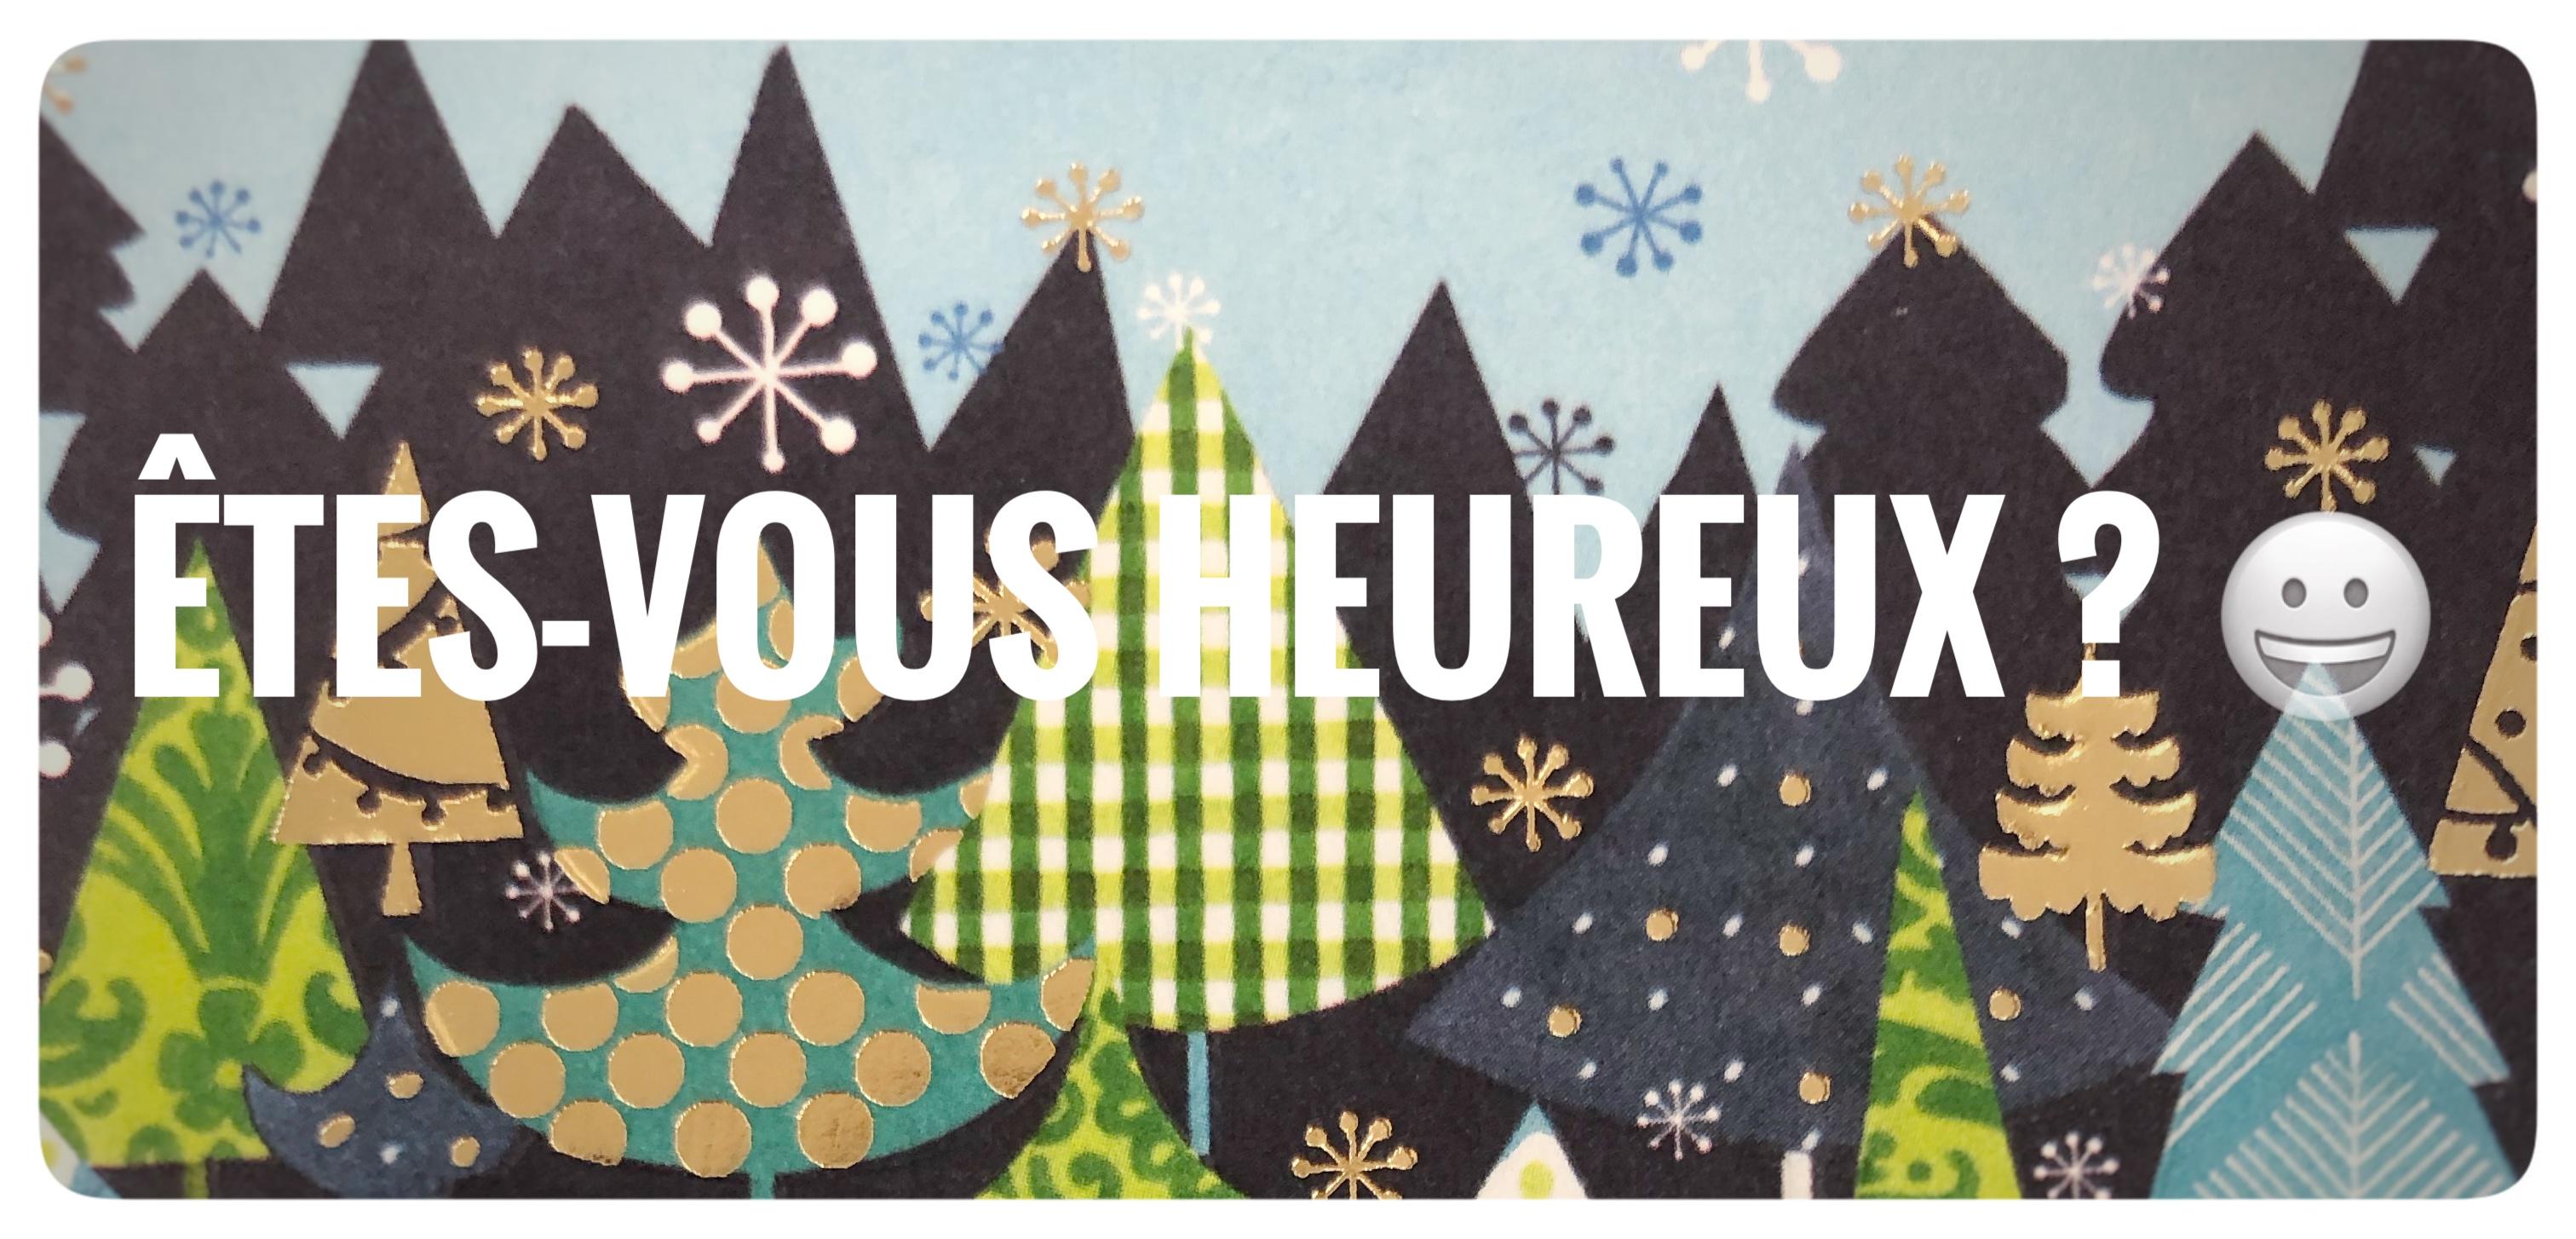 https://gestion.librairiejeancalvin.fr/themes/default/img/accueil/Noel_2020_etes_vous_heureux.jpg